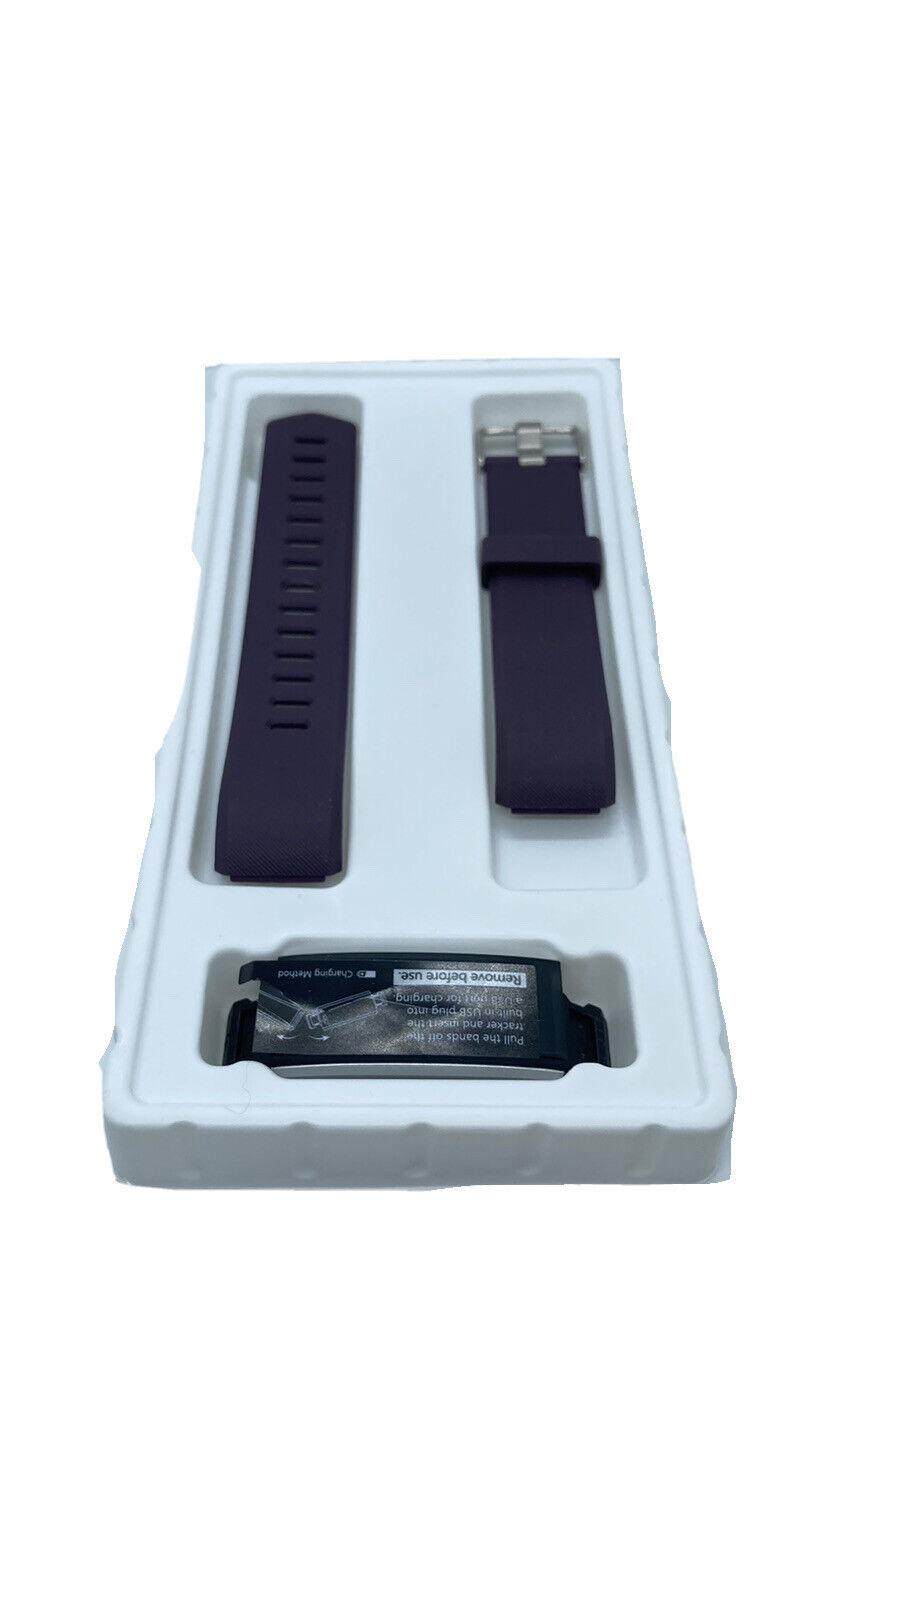 Lintelek Fitness Tracker Heart Rate Monitor ID115Plus HR Purple fitness heart id115plus lintelek monitor purple rate tracker